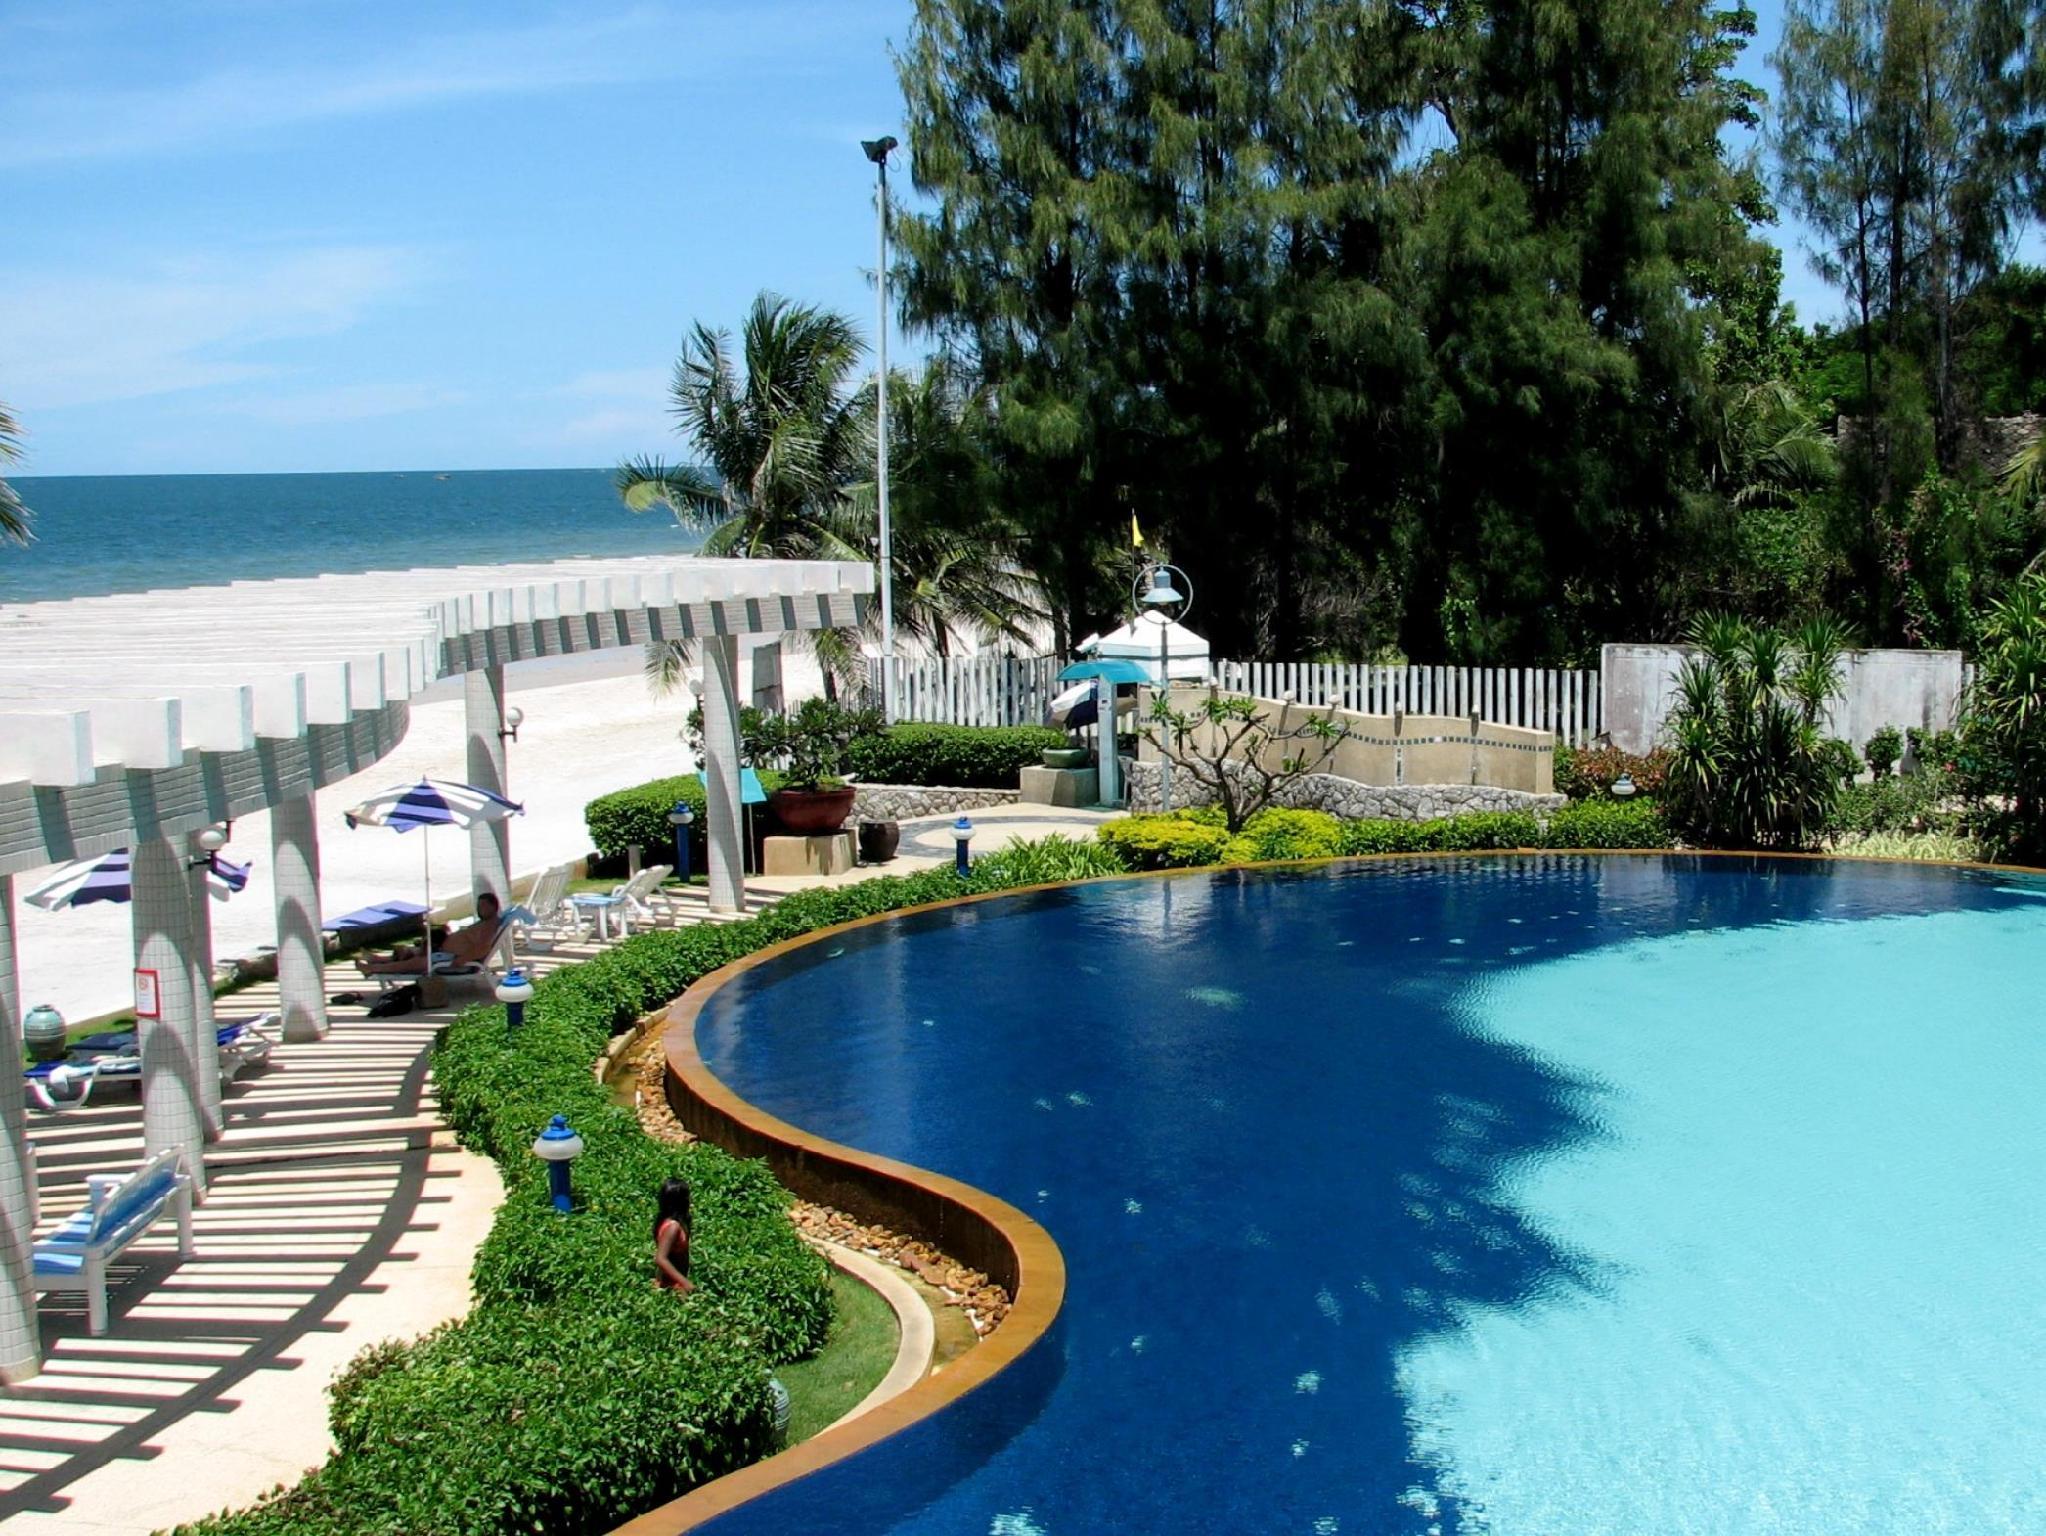 Baan San Saran Beach Front Condo Hua Hin - Hotels and Accommodation in Thailand, Asia